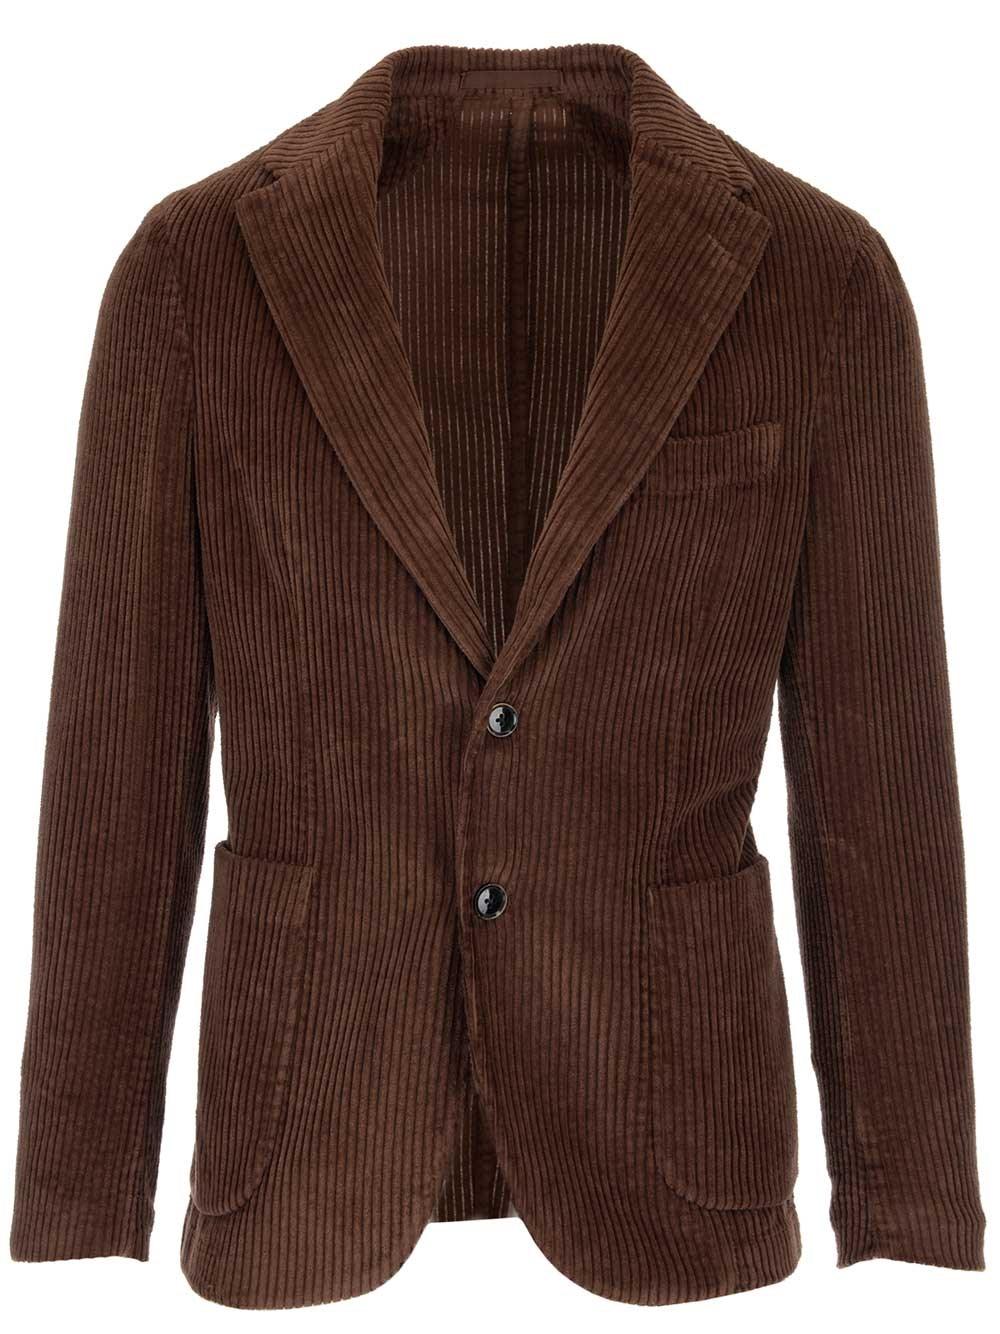 AL DUCA D'AOSTA 1902 Brown Velvet Jacket